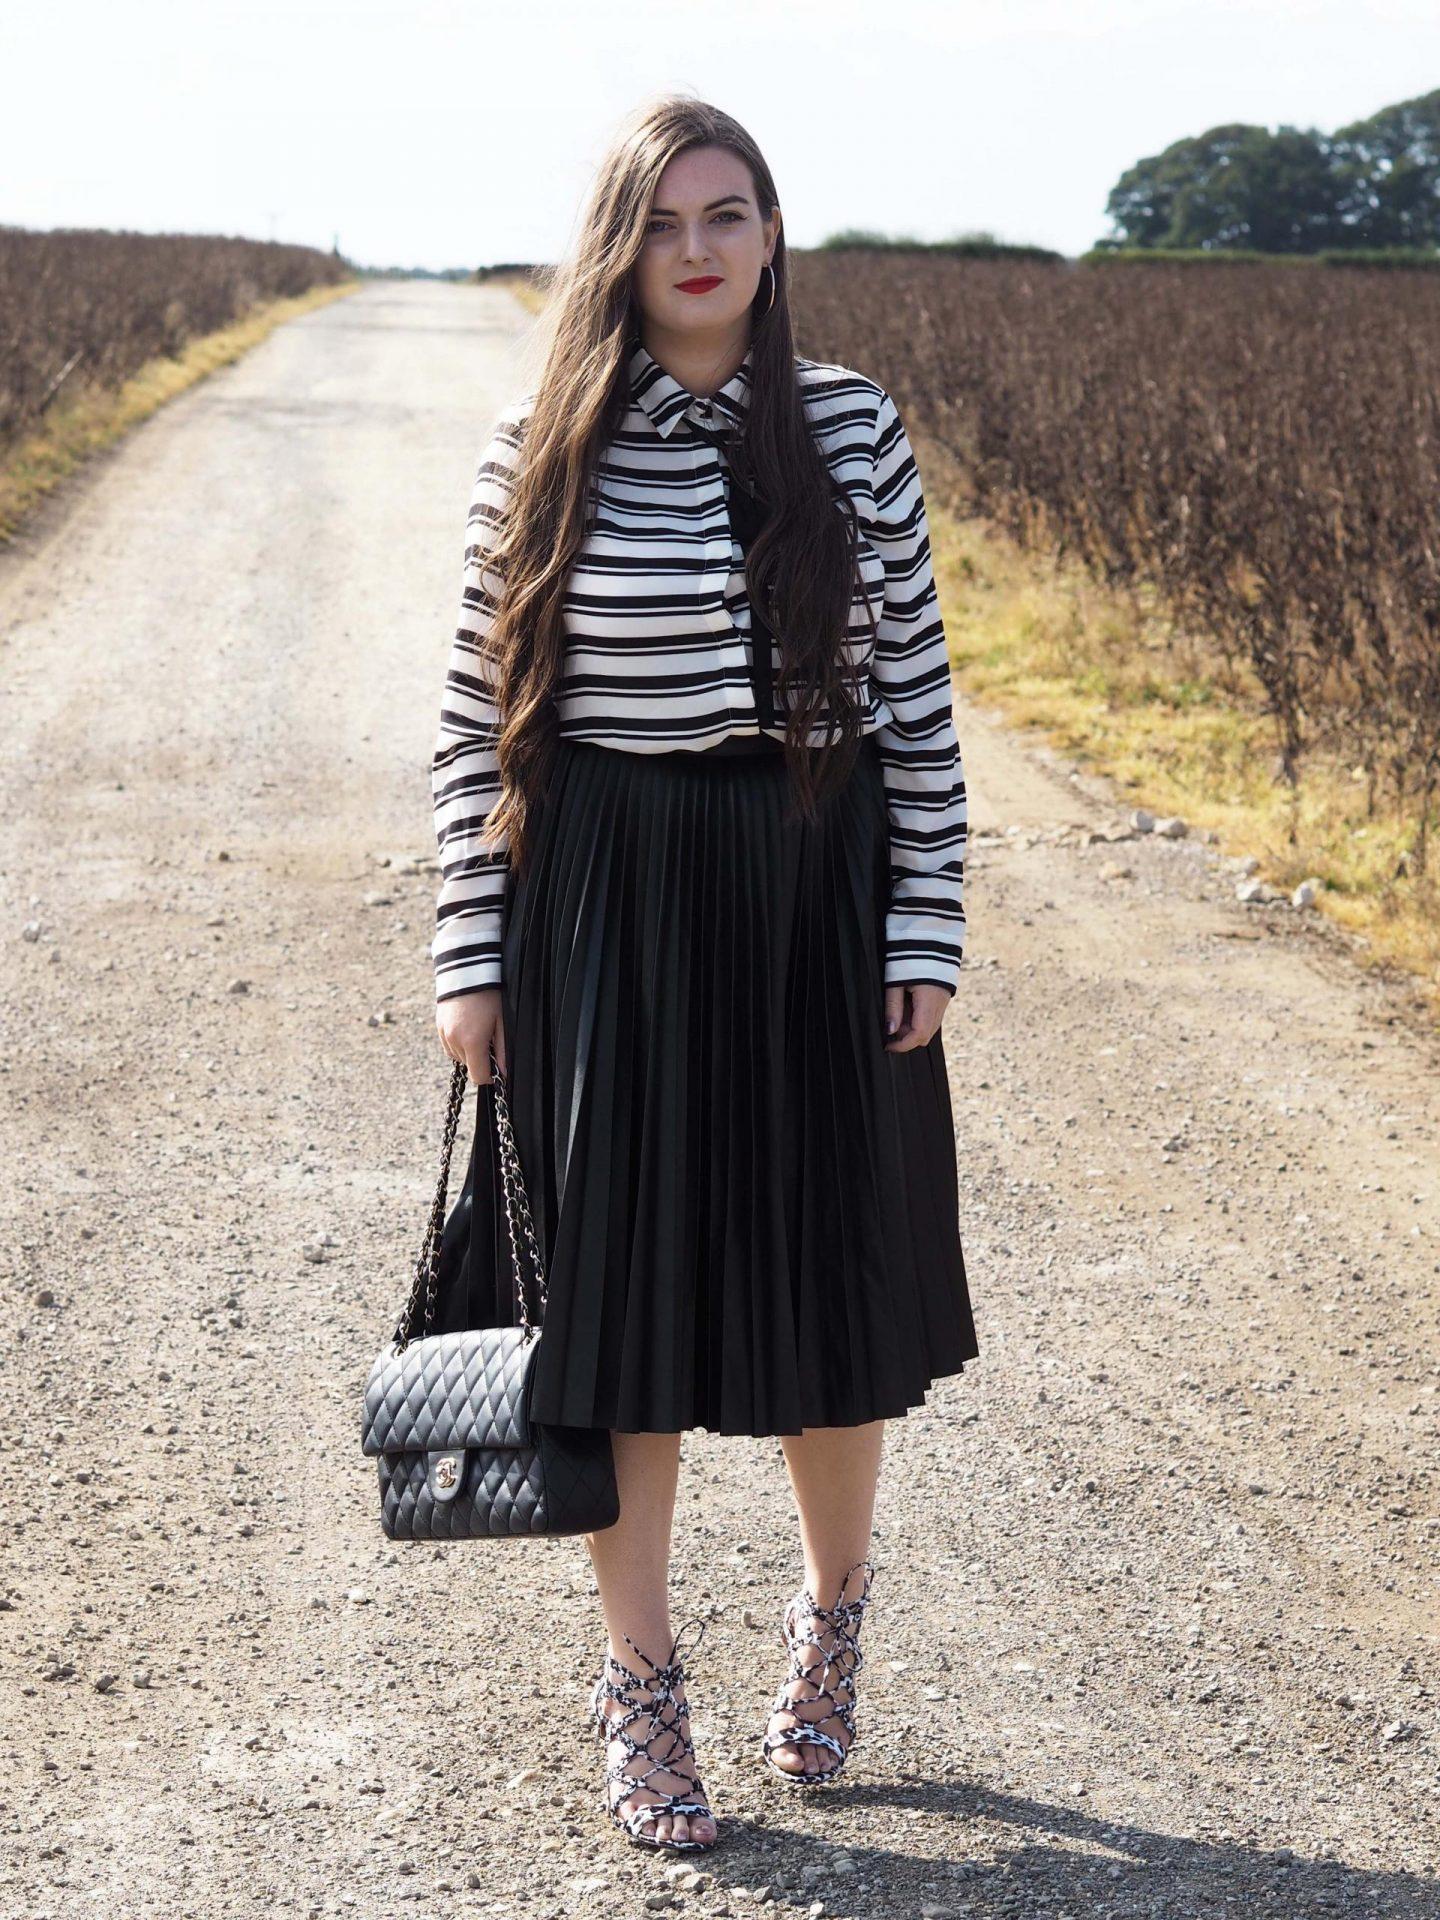 closet-leather-pleated-skirts-and-stripes-rachel-nicole-uk-blogger-1